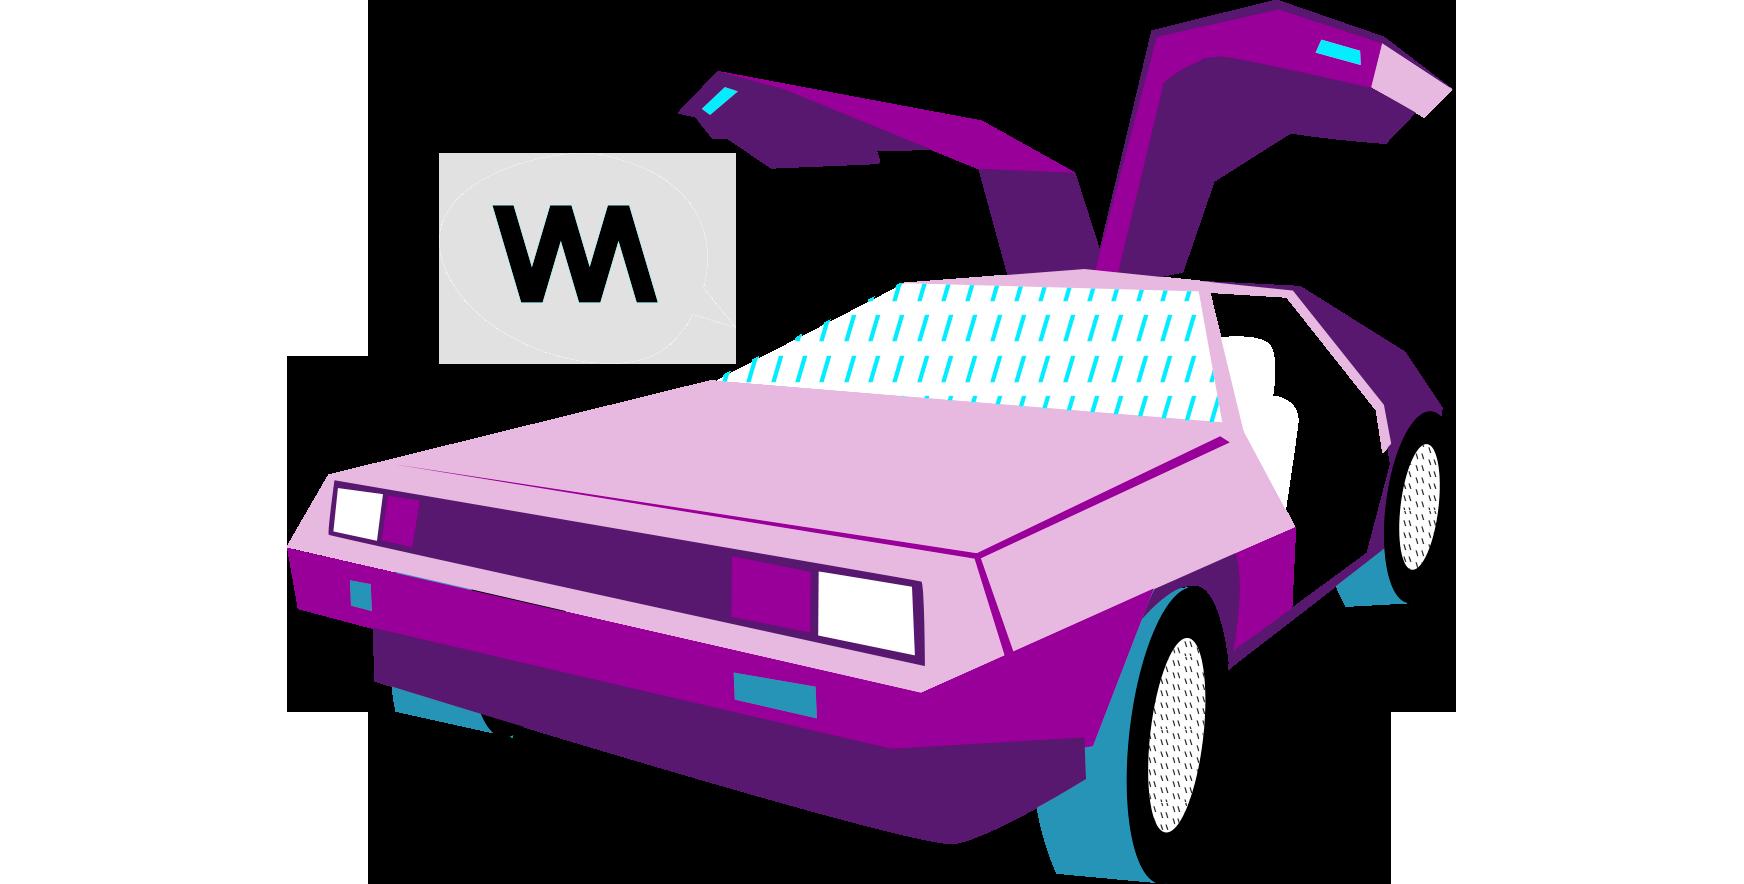 A retro futuristic pink car